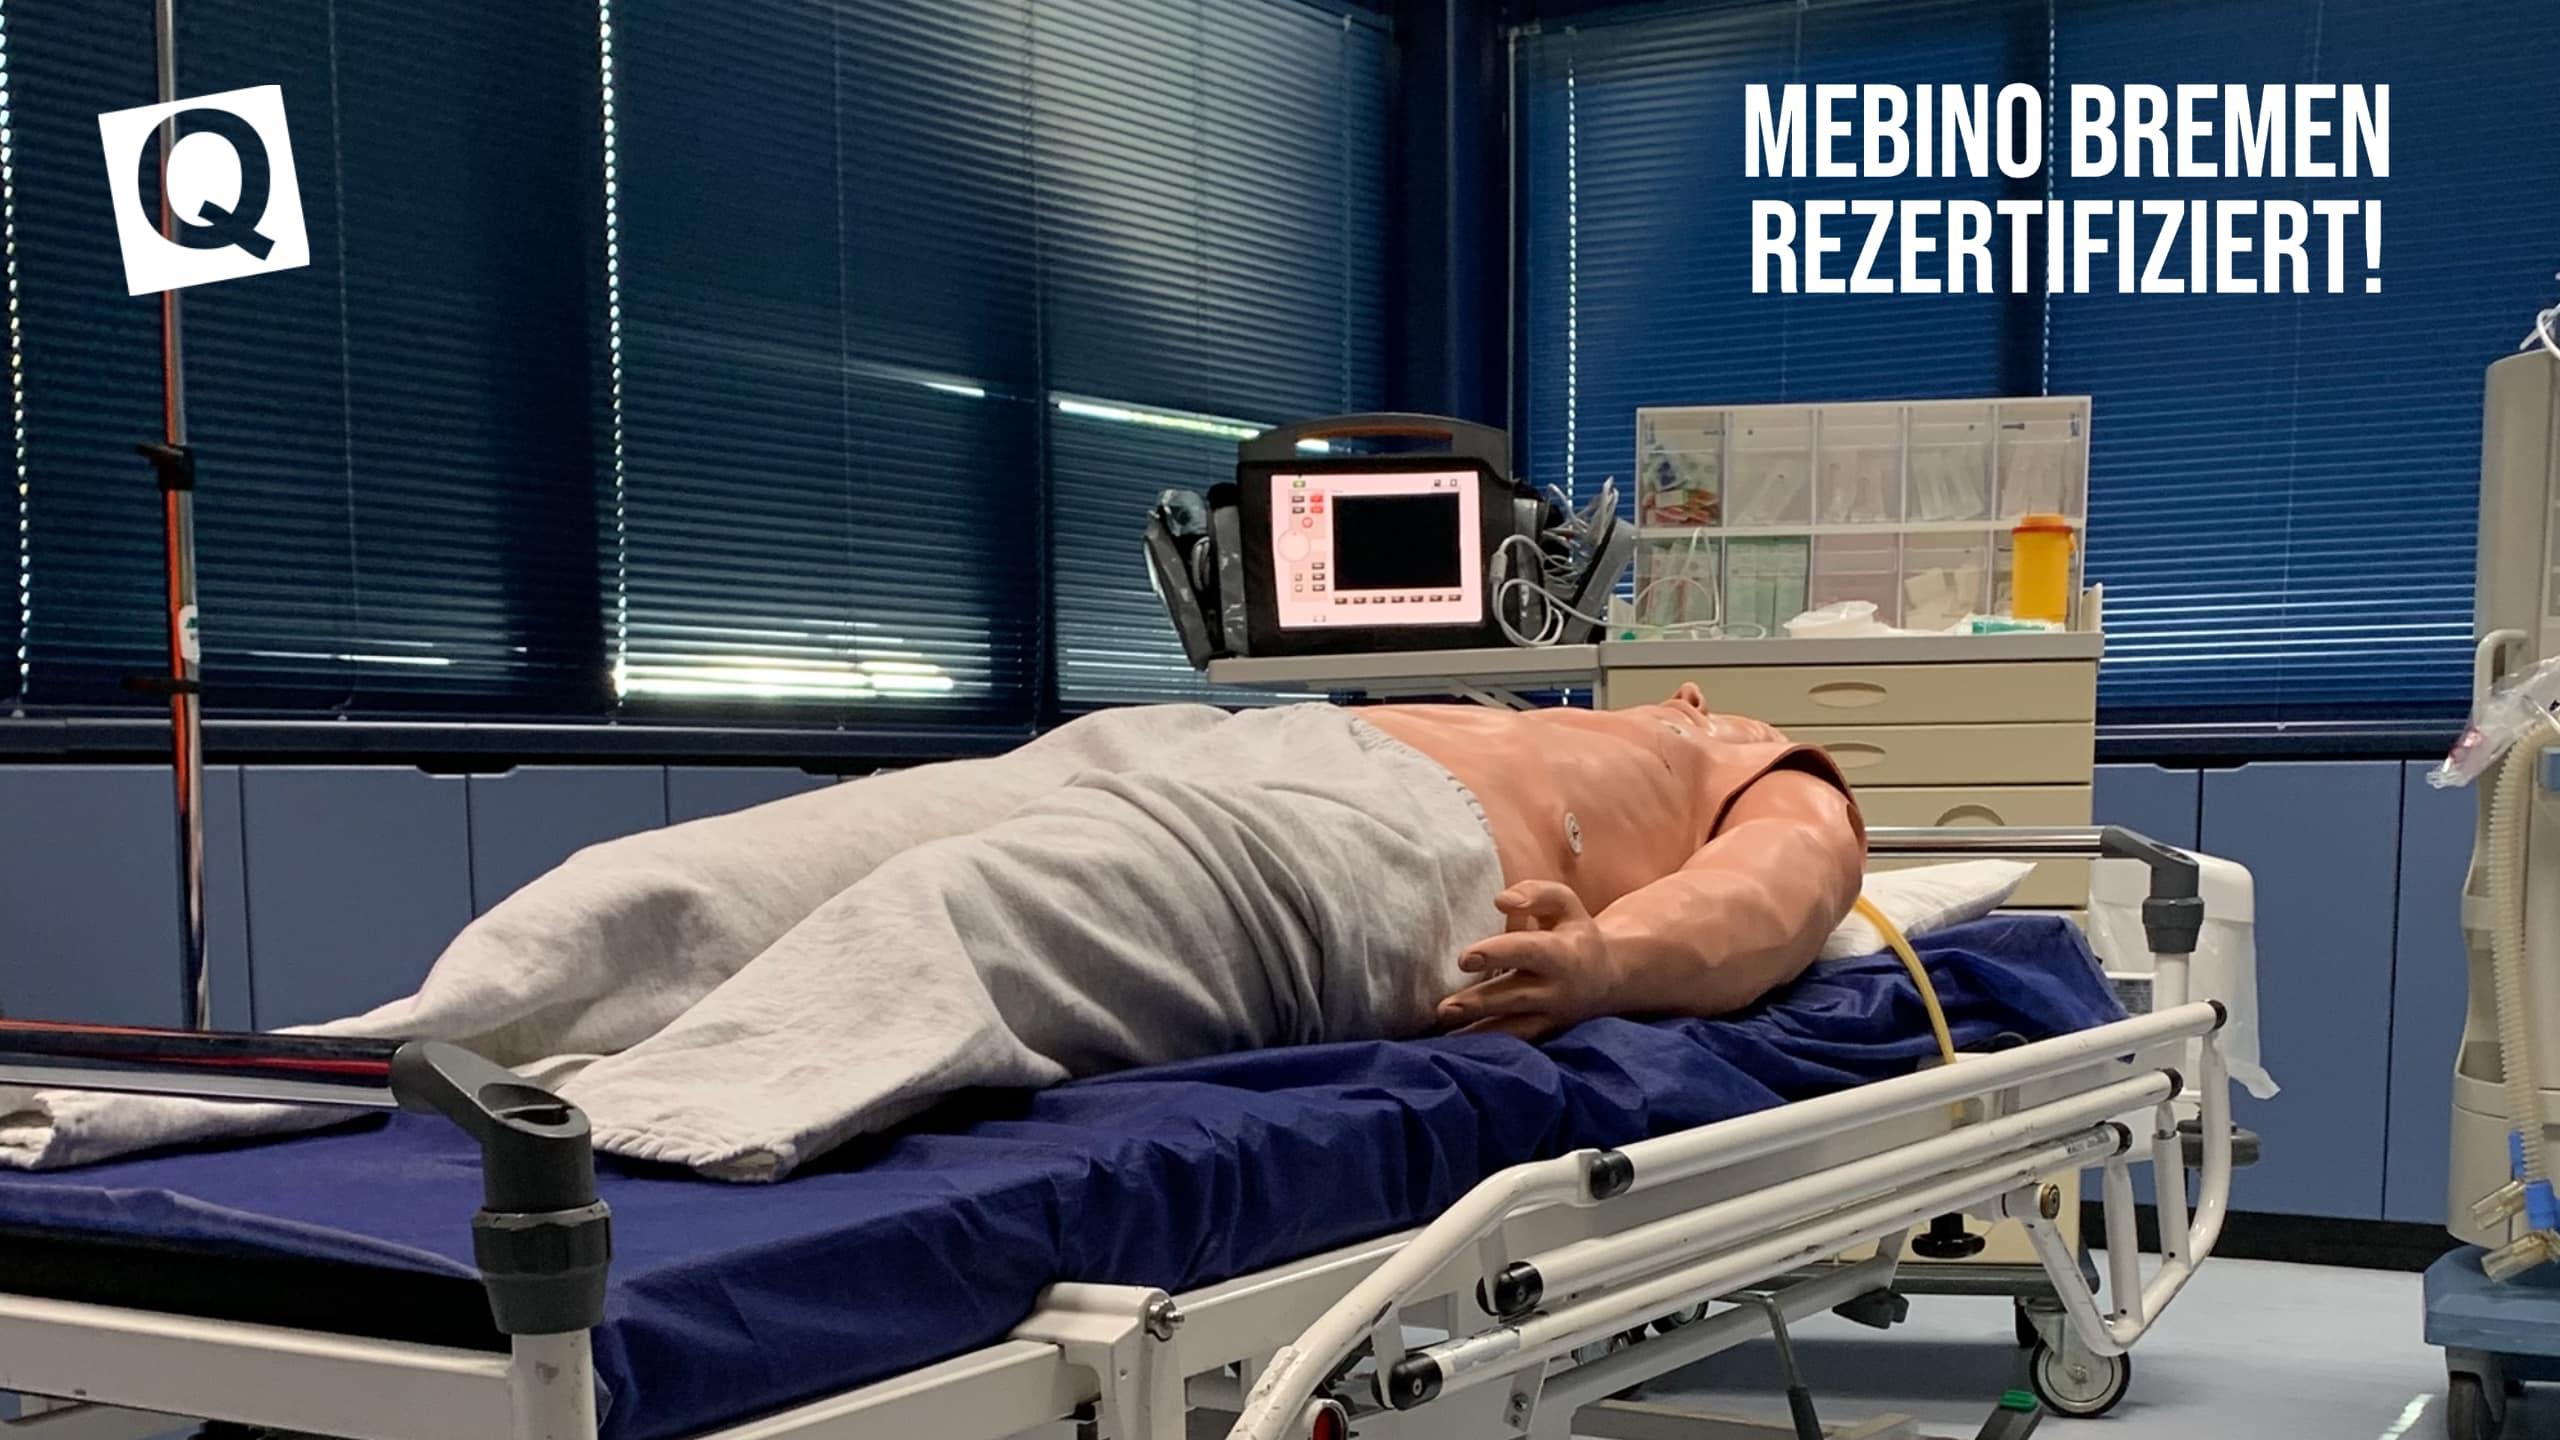 mebino Bremen als ITS rezertifiziert